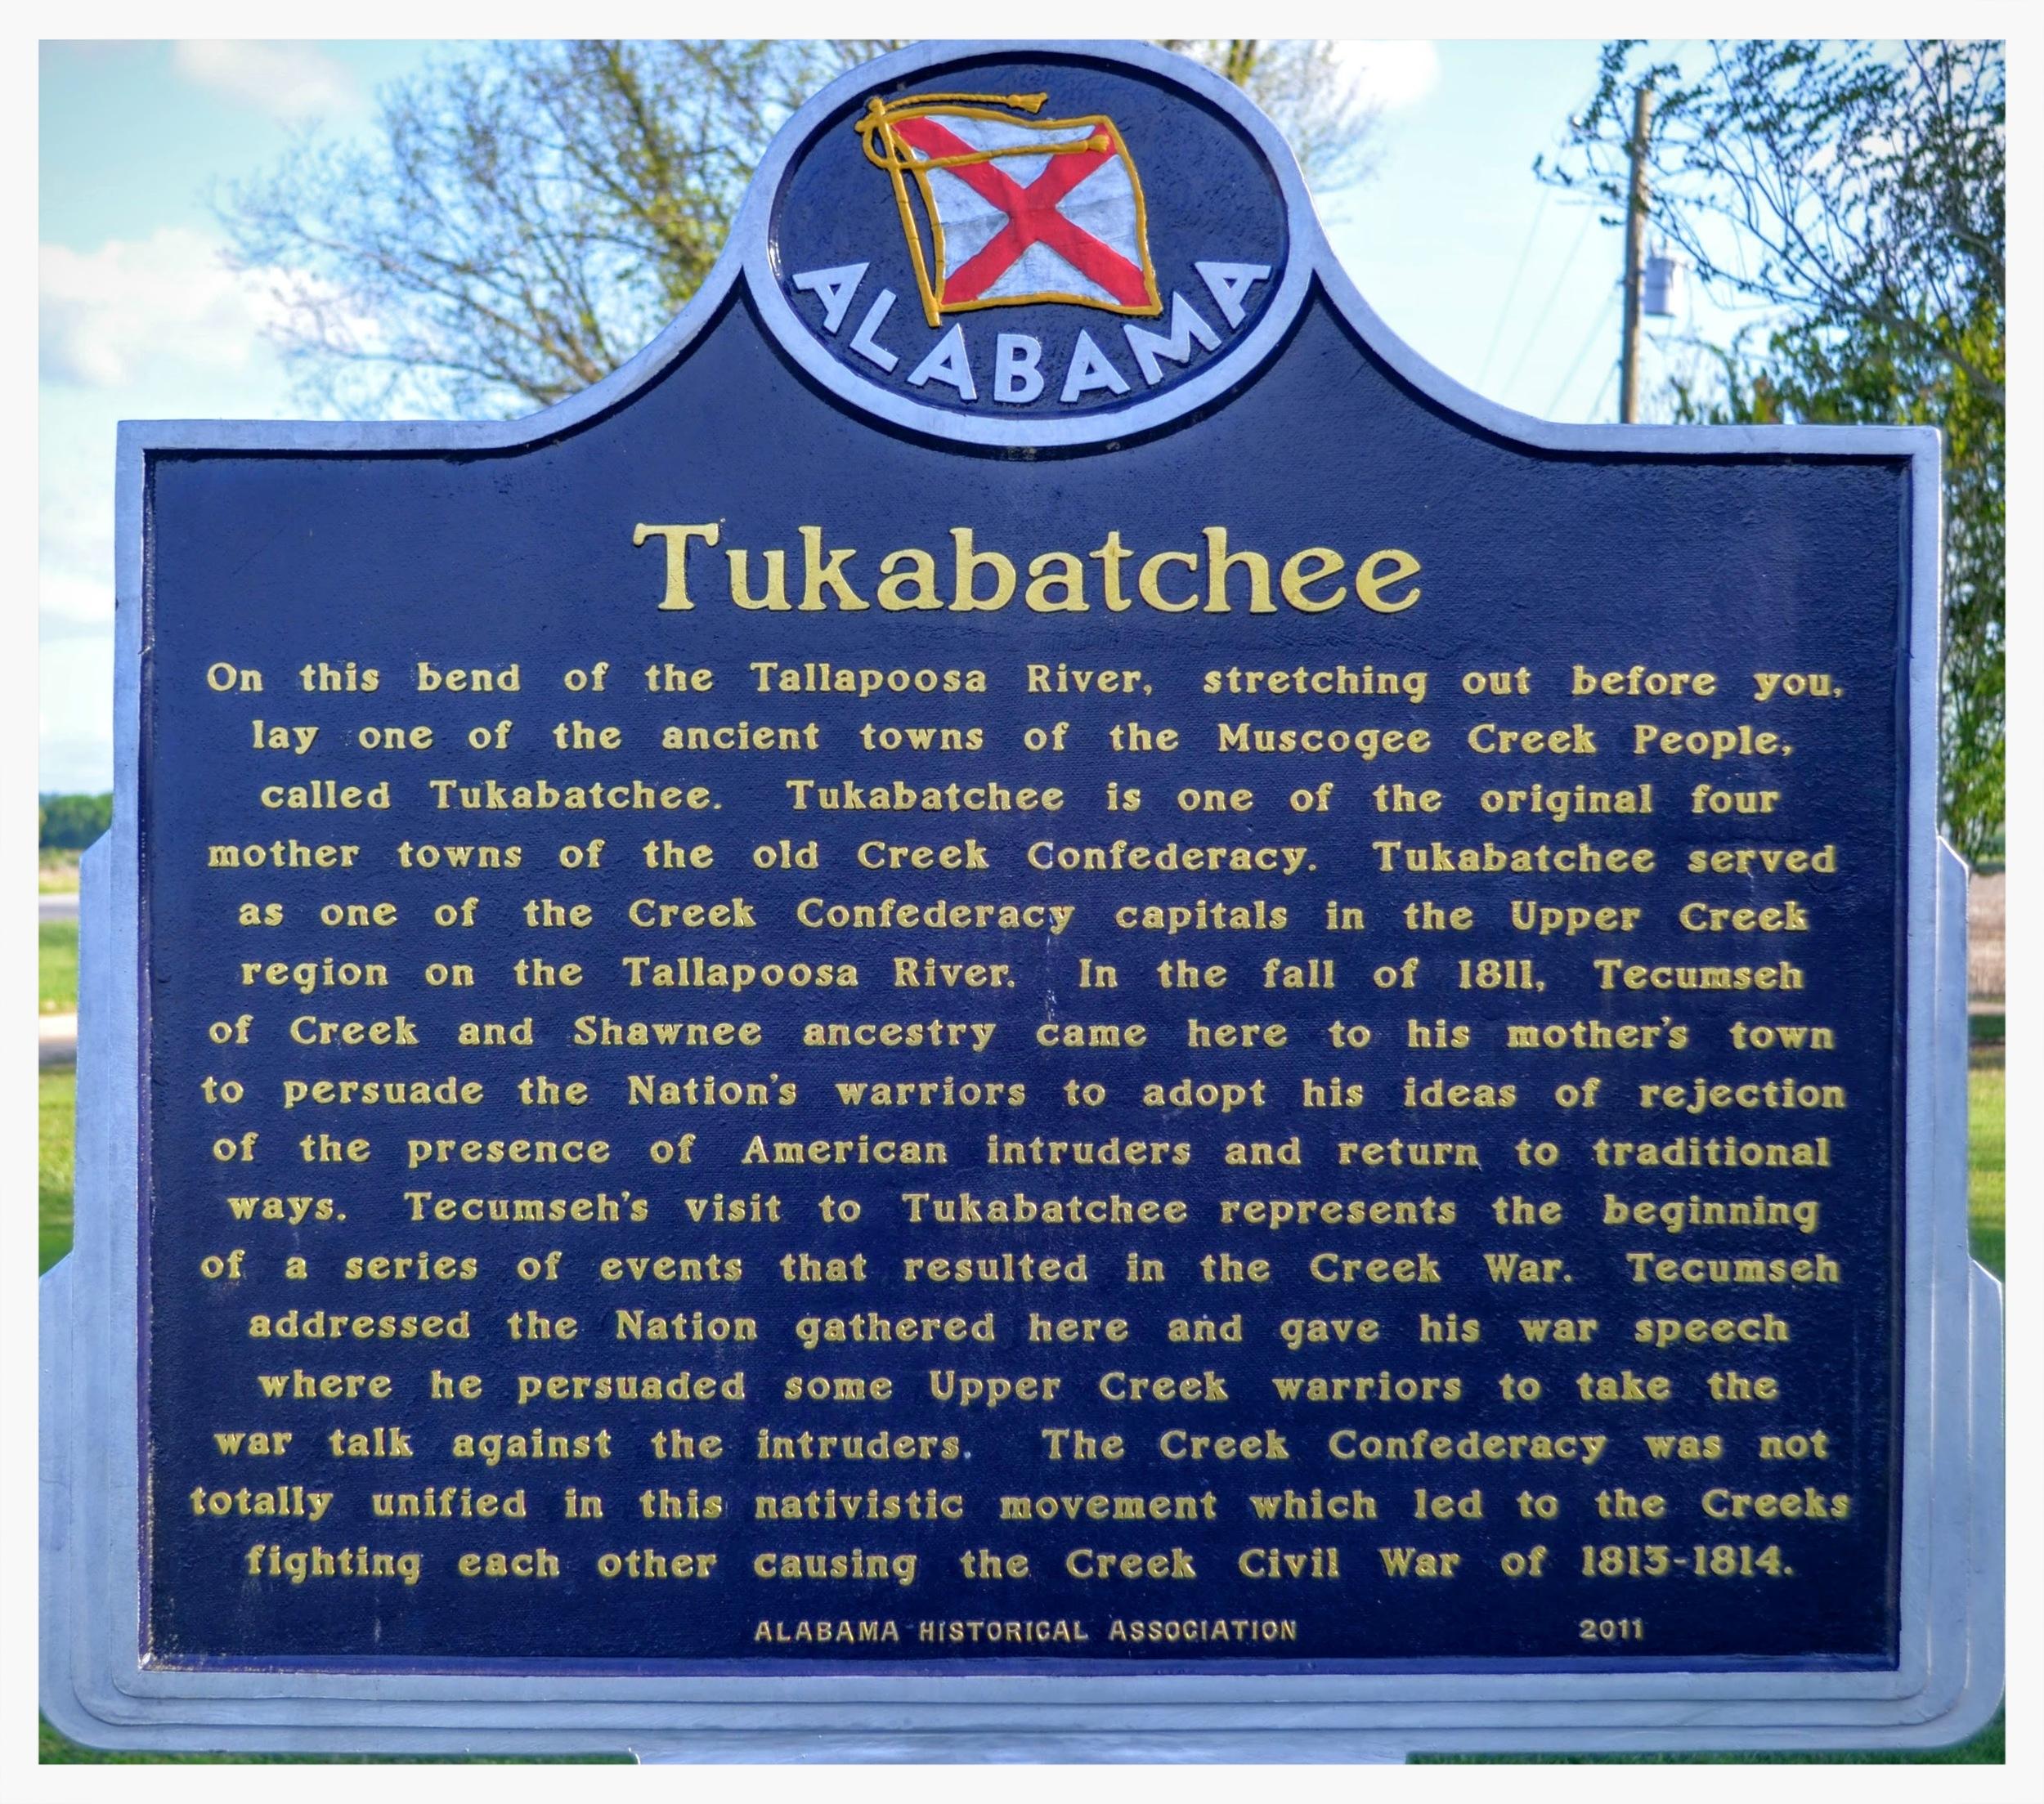 Tukabatchee historical marker, Elmore County, Alabama